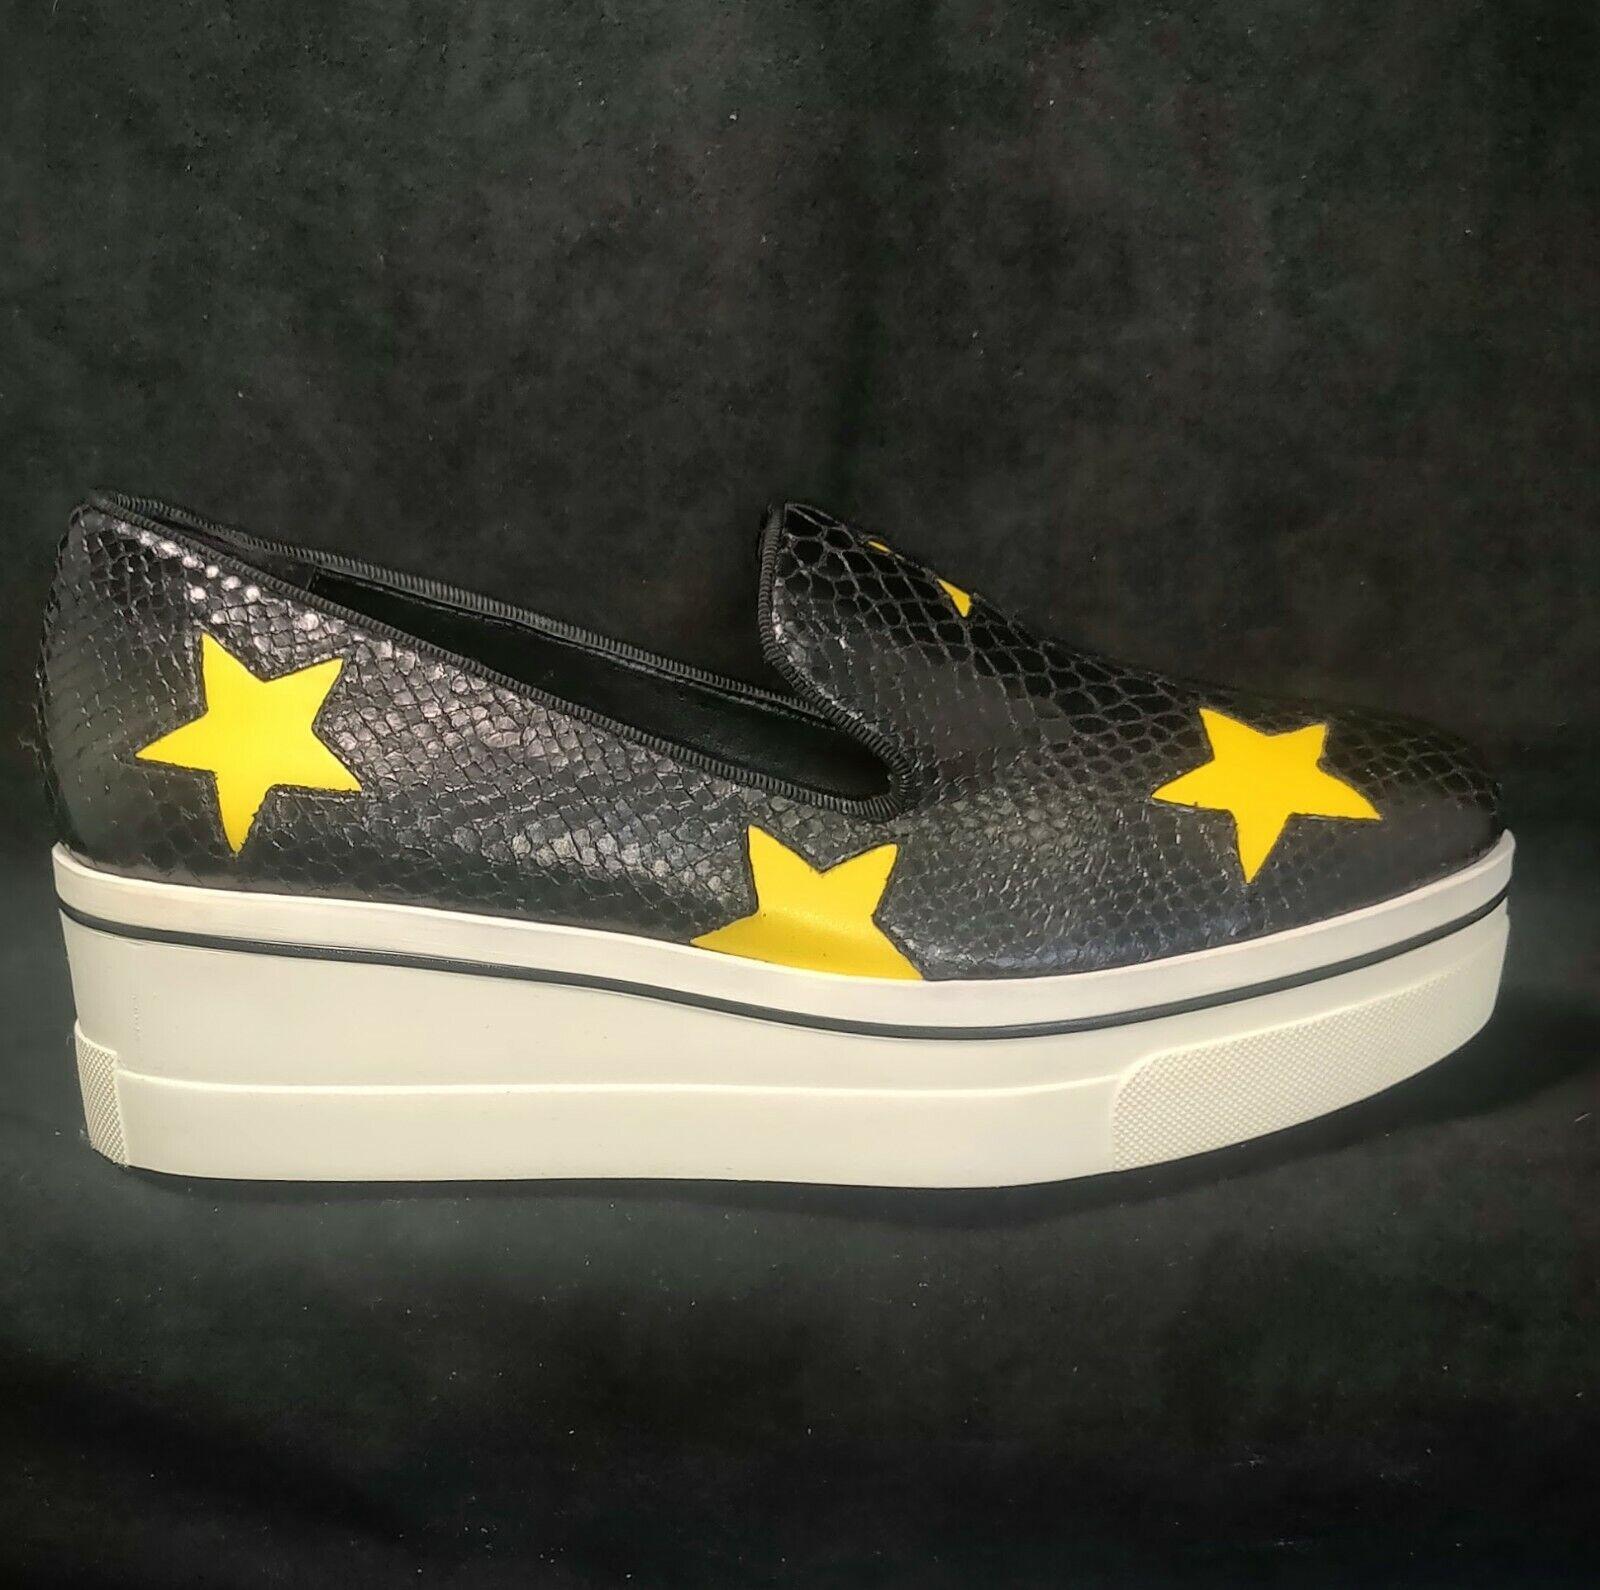 Stella McCartney BINX Scarpa Star Platform Black Slip-On Loafer US 10 EU 41